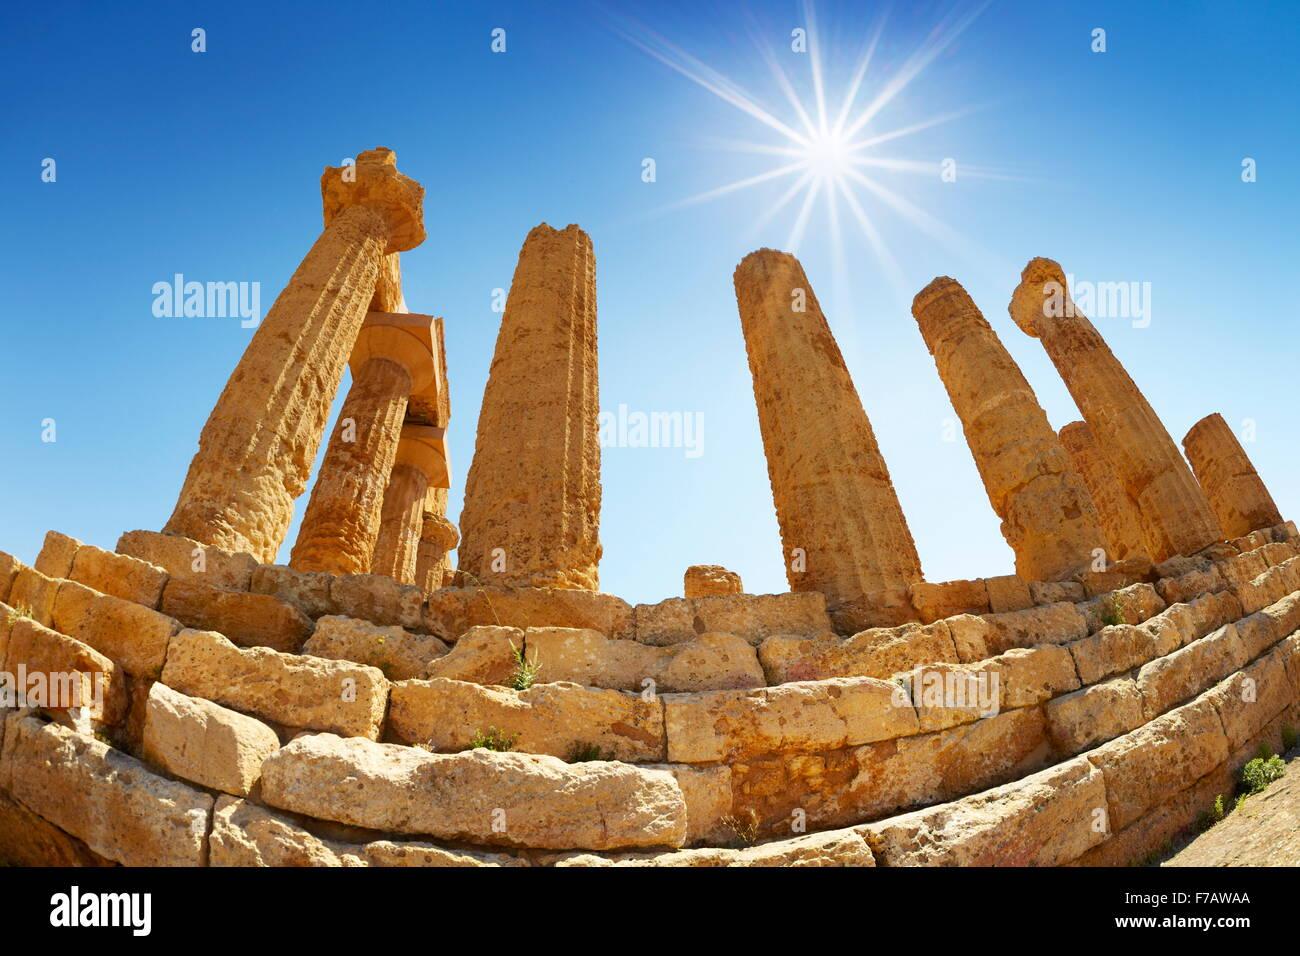 Agrigento - Temple of Hera in Valley of Temples (Valle dei Templi), Agrigento (Girgenti), Sicily, Italy UNESCO - Stock Image